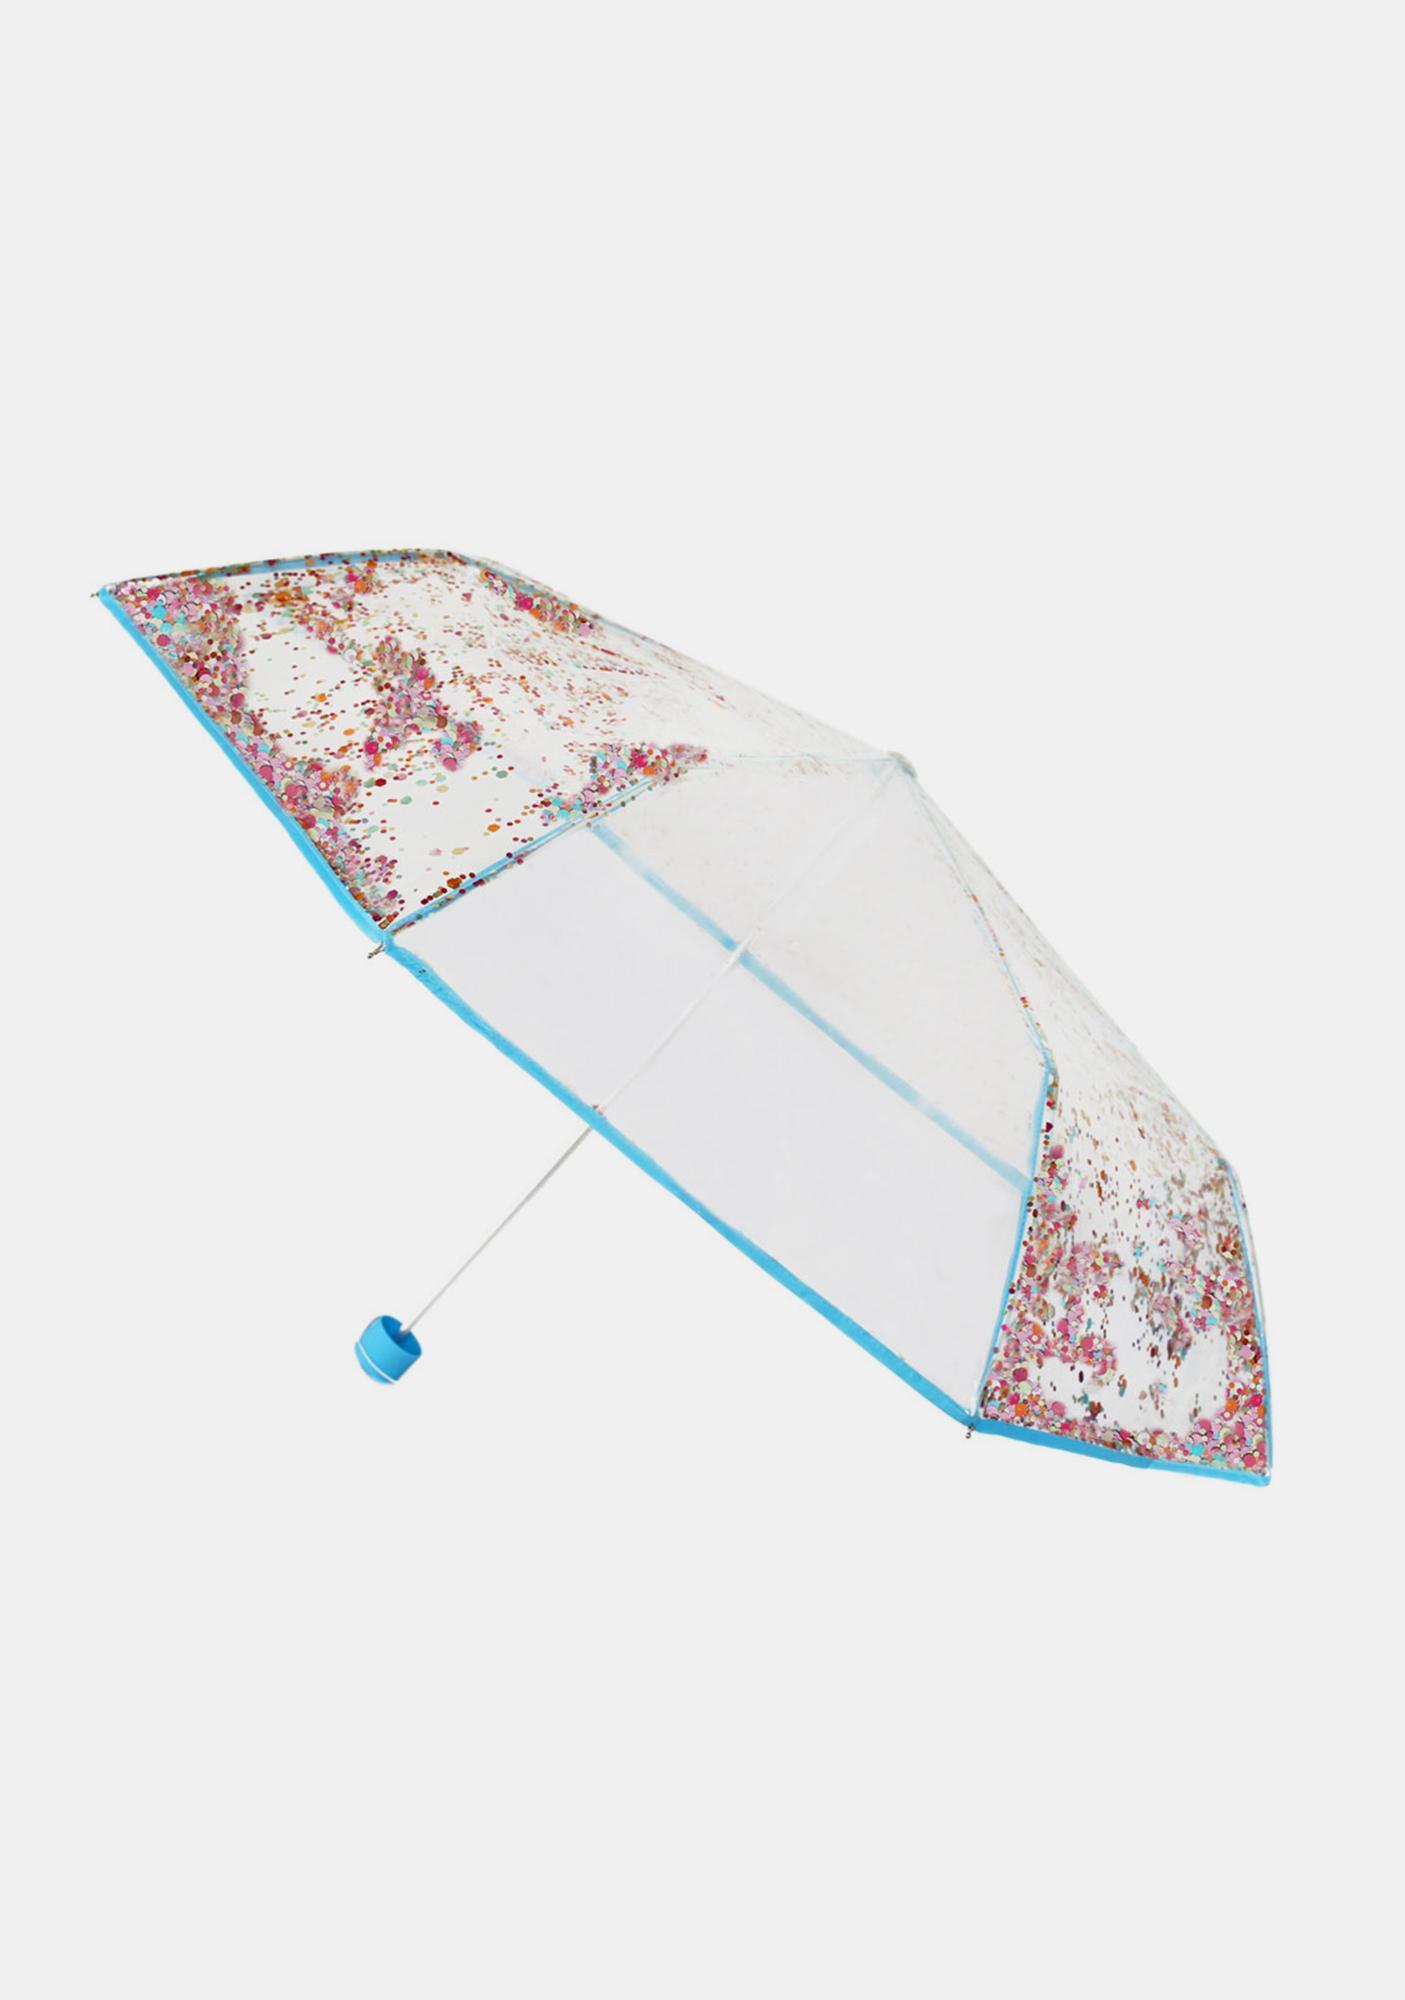 Packed Party Raining Confetti Umbrella